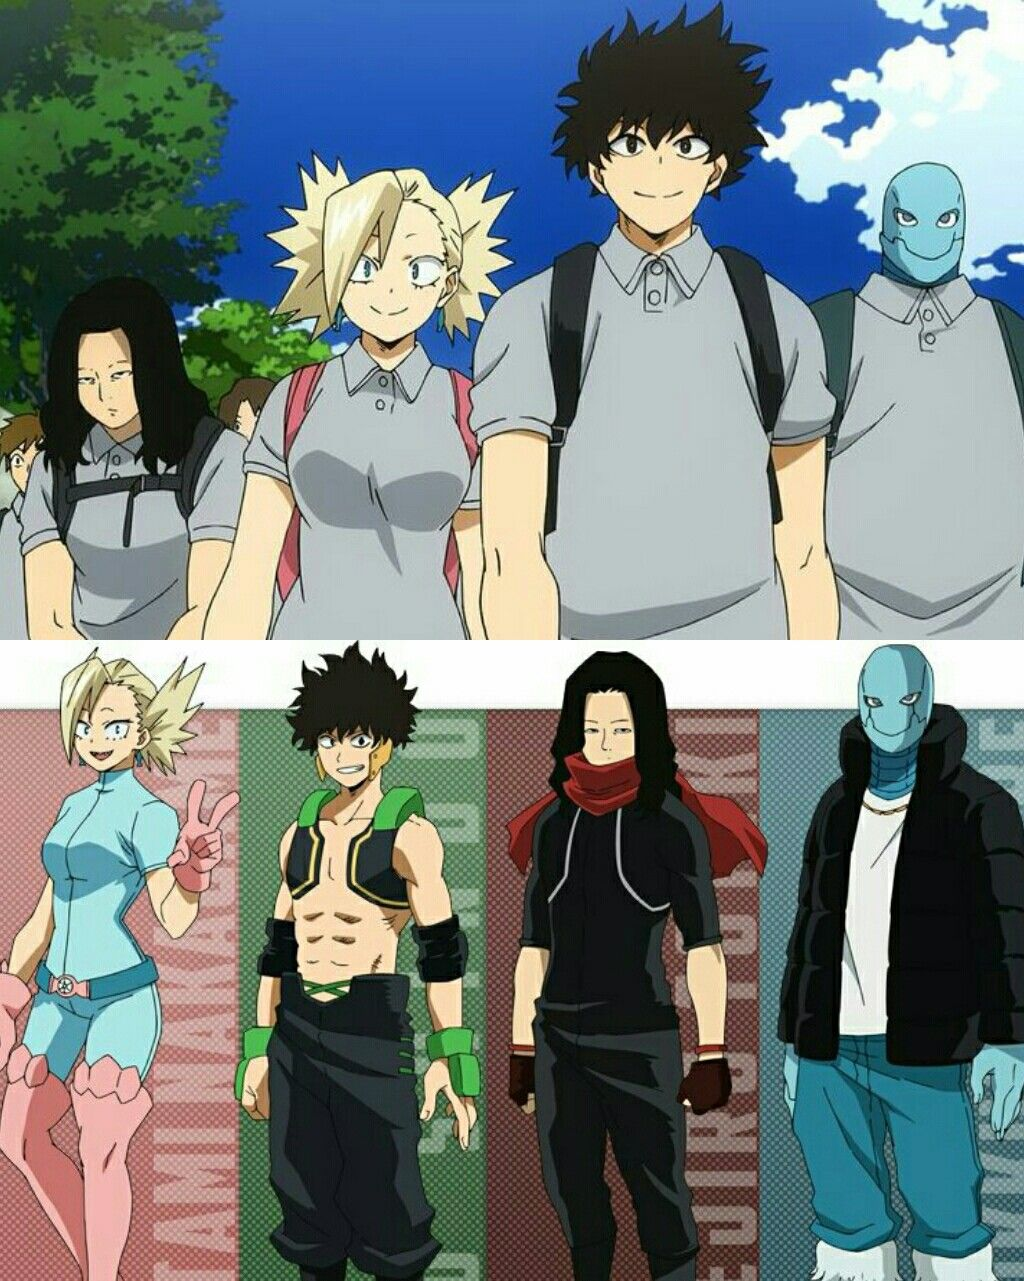 Boku no hero academia | season 3 cap 15 | | Anime | My hero